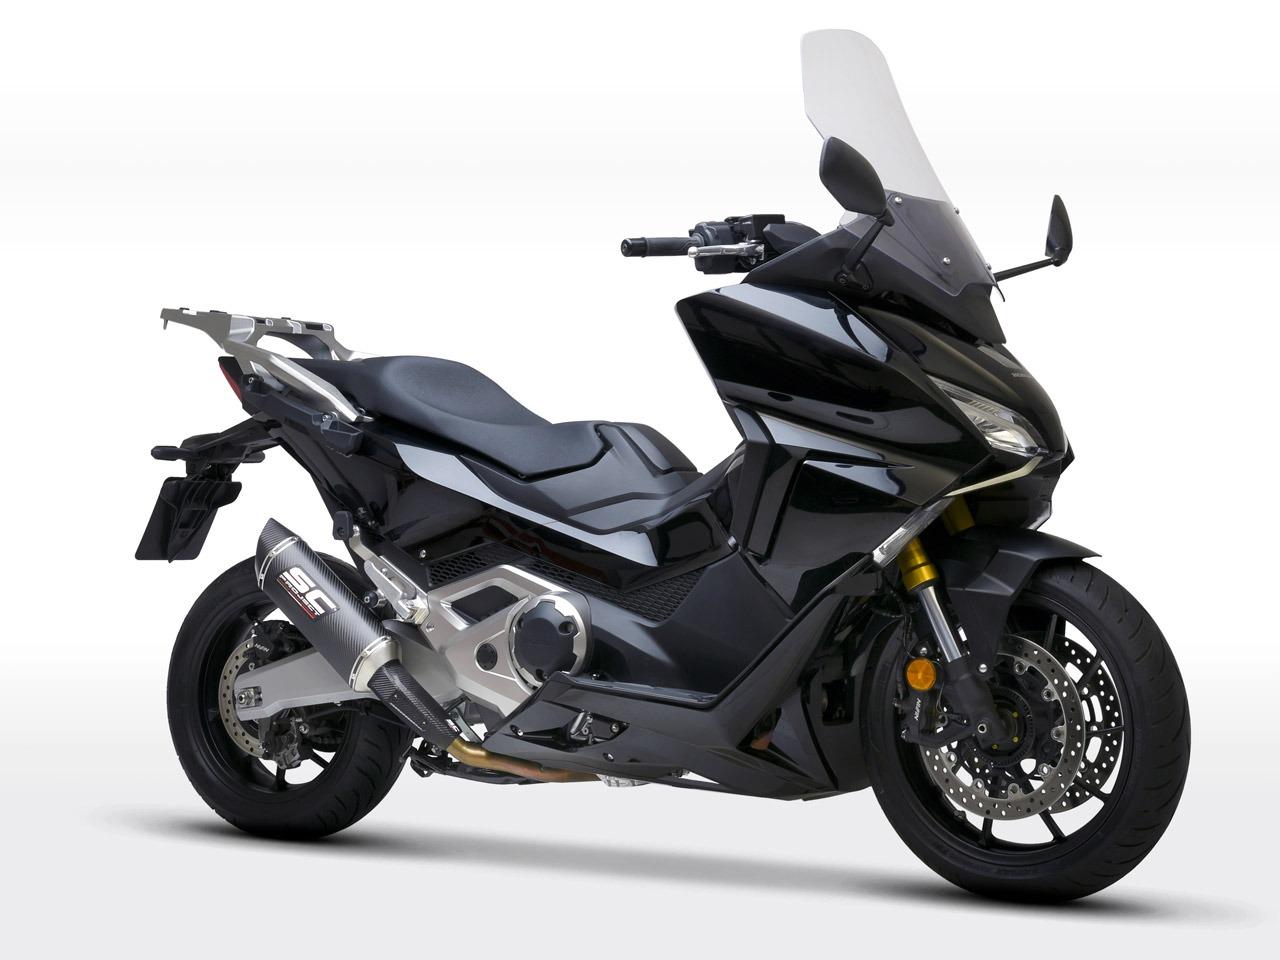 Honda_Forza750_my2021_SC1S-Carbonio_3-4Anteriore_1280x960px_web-partnership